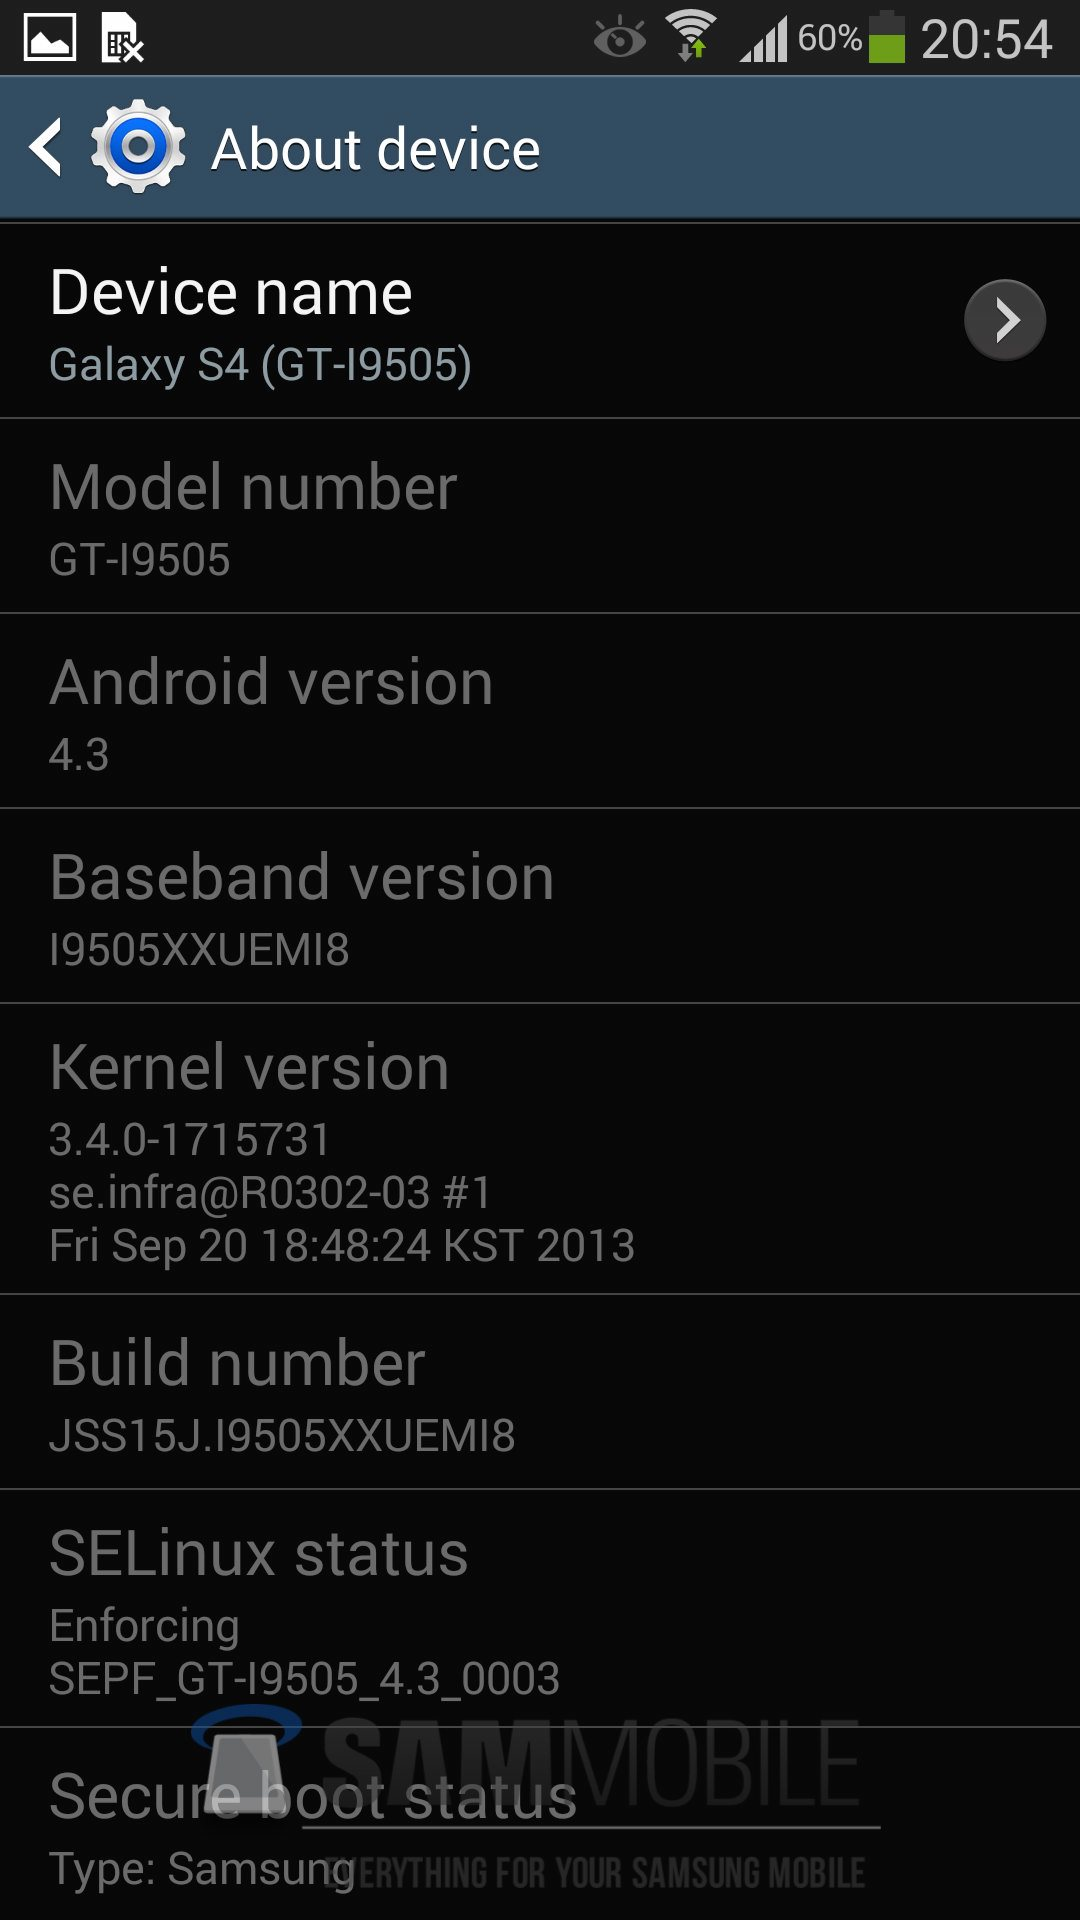 Android4.3_Samsung_Galaxy_S4_XXUEMI8 (1)